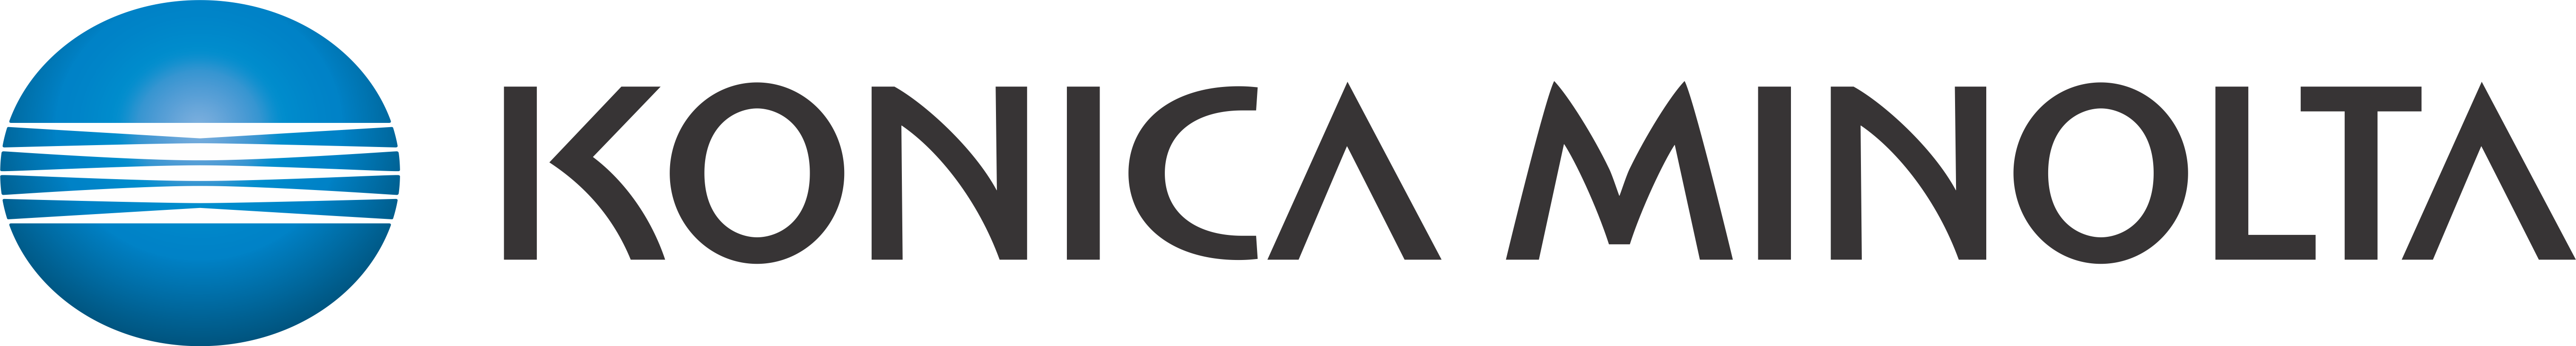 Top Drive Sponsors - $1,000 - Konica Minolta - Logo